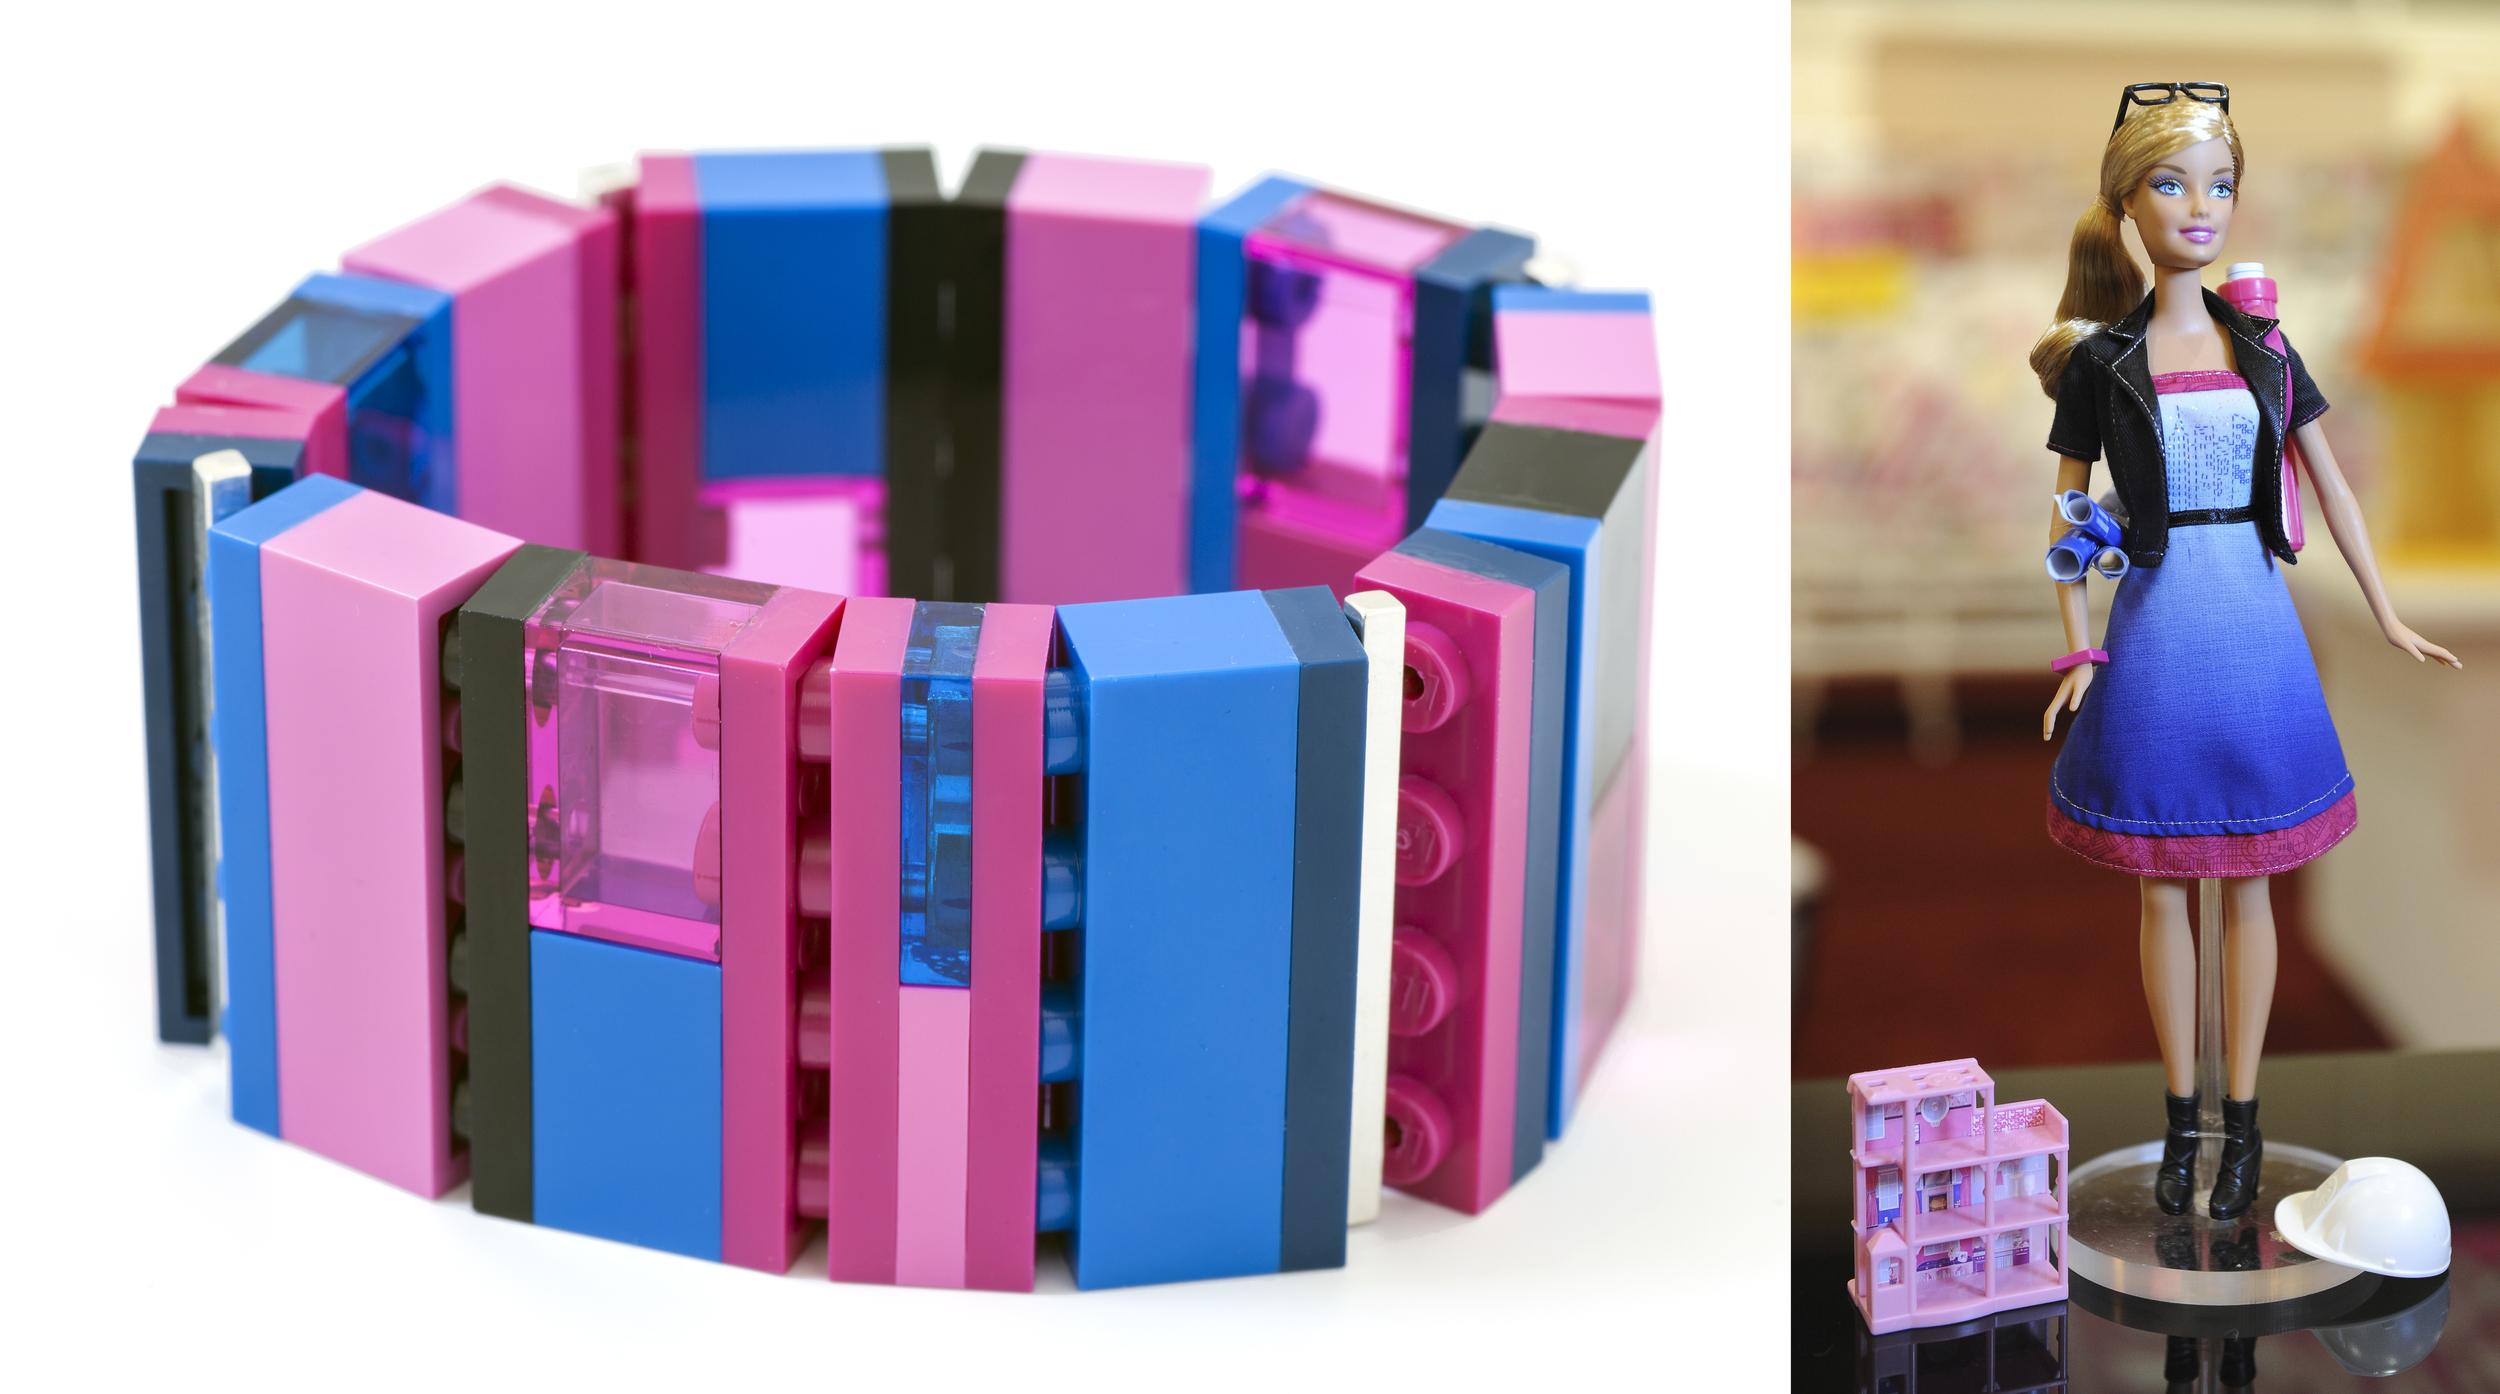 One-of-a-kind custom collaboration bracelet based on a ArchitectBarbie® palette